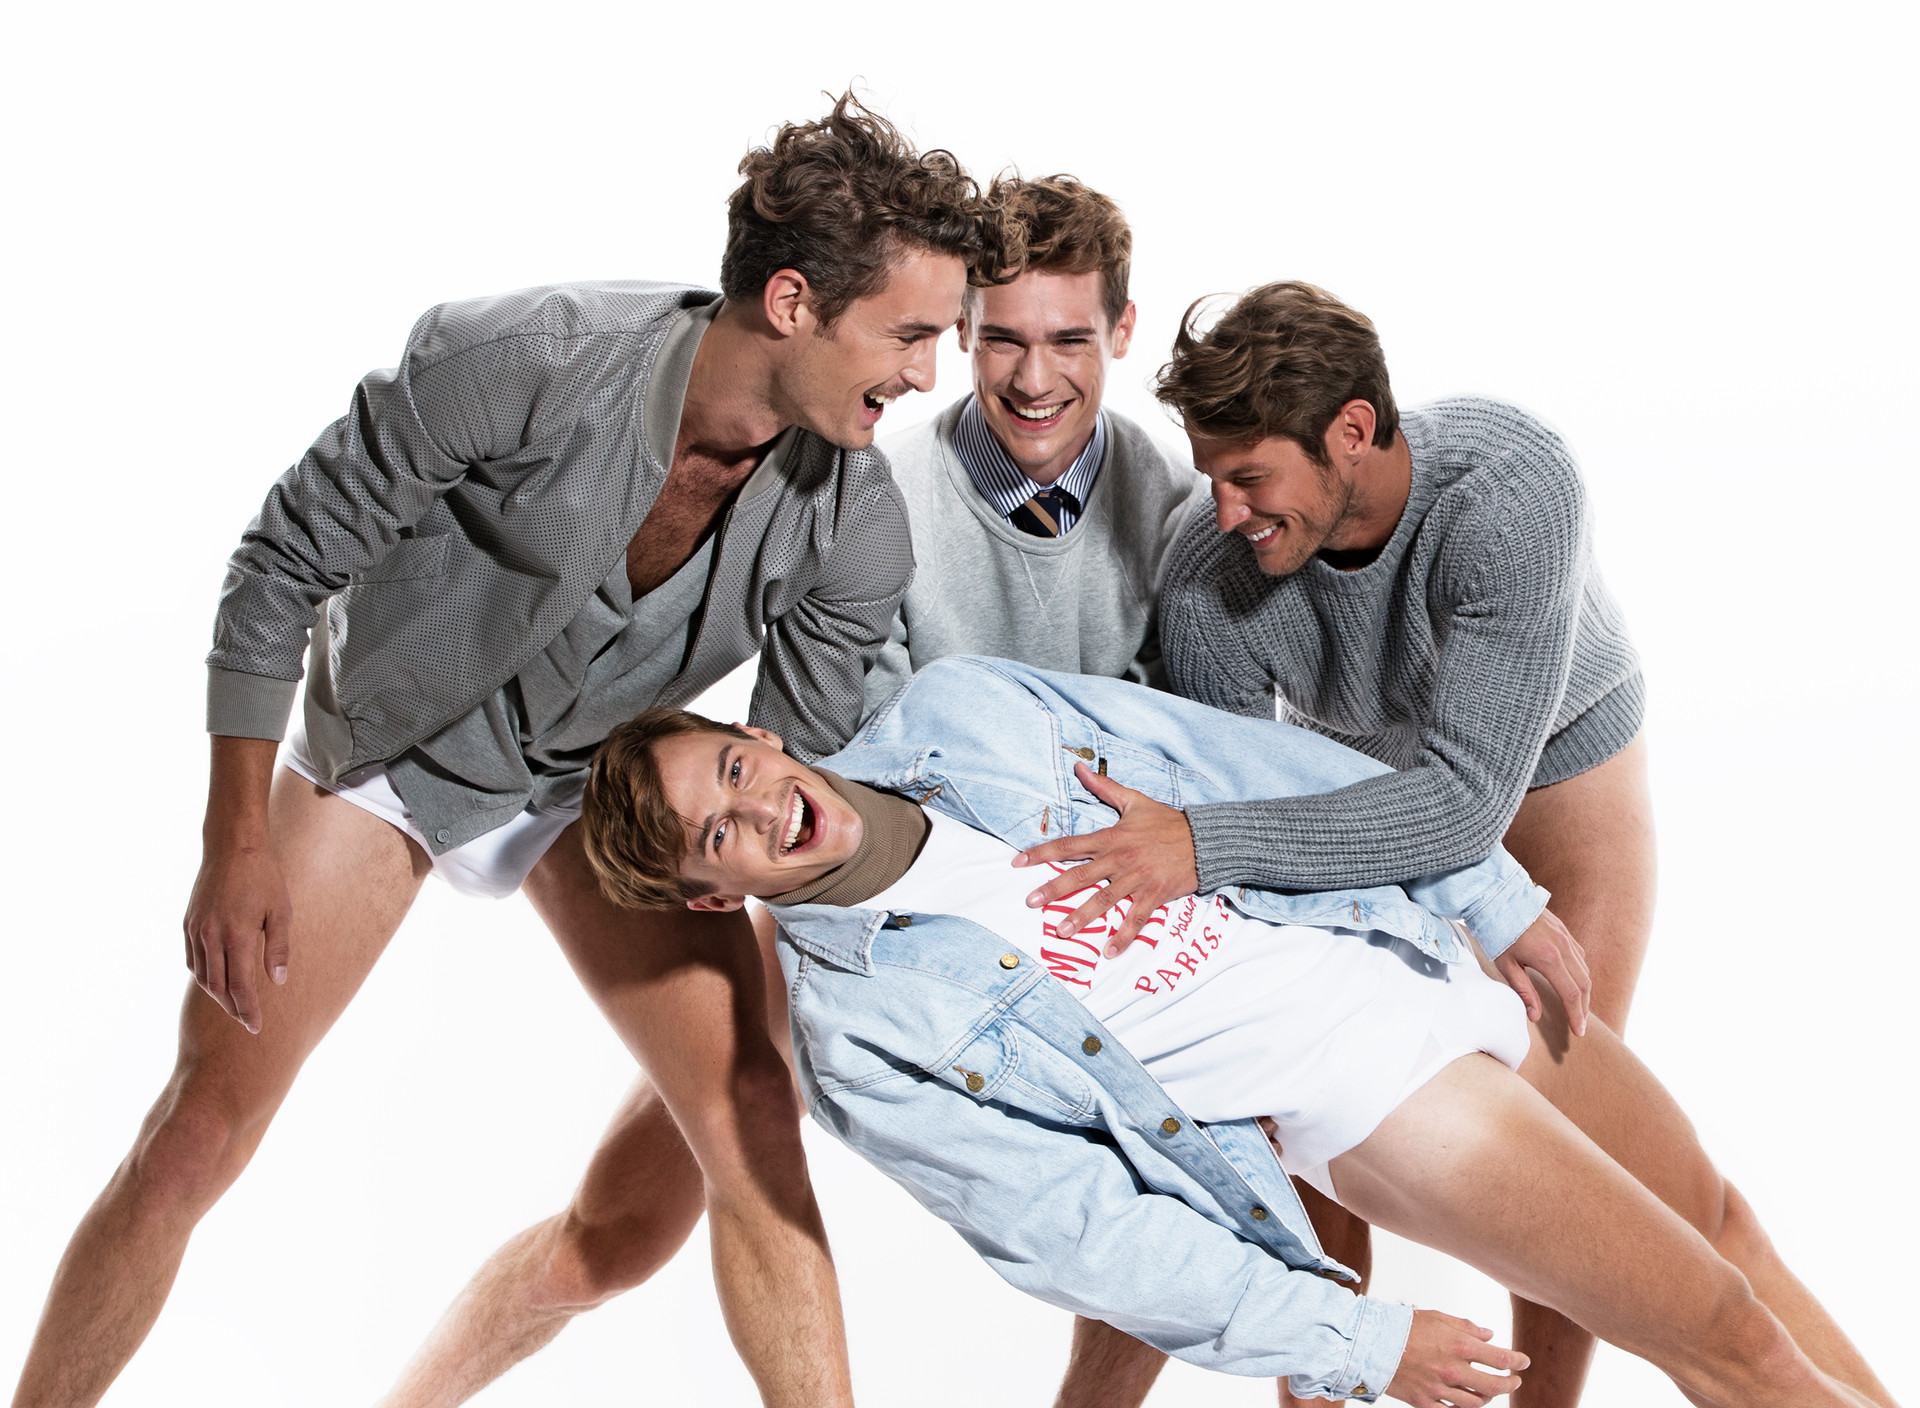 fashion, boys, men, menwear, underwear, suit, fun, look at us, vlado golub photography, Vlado Golub Fotografie